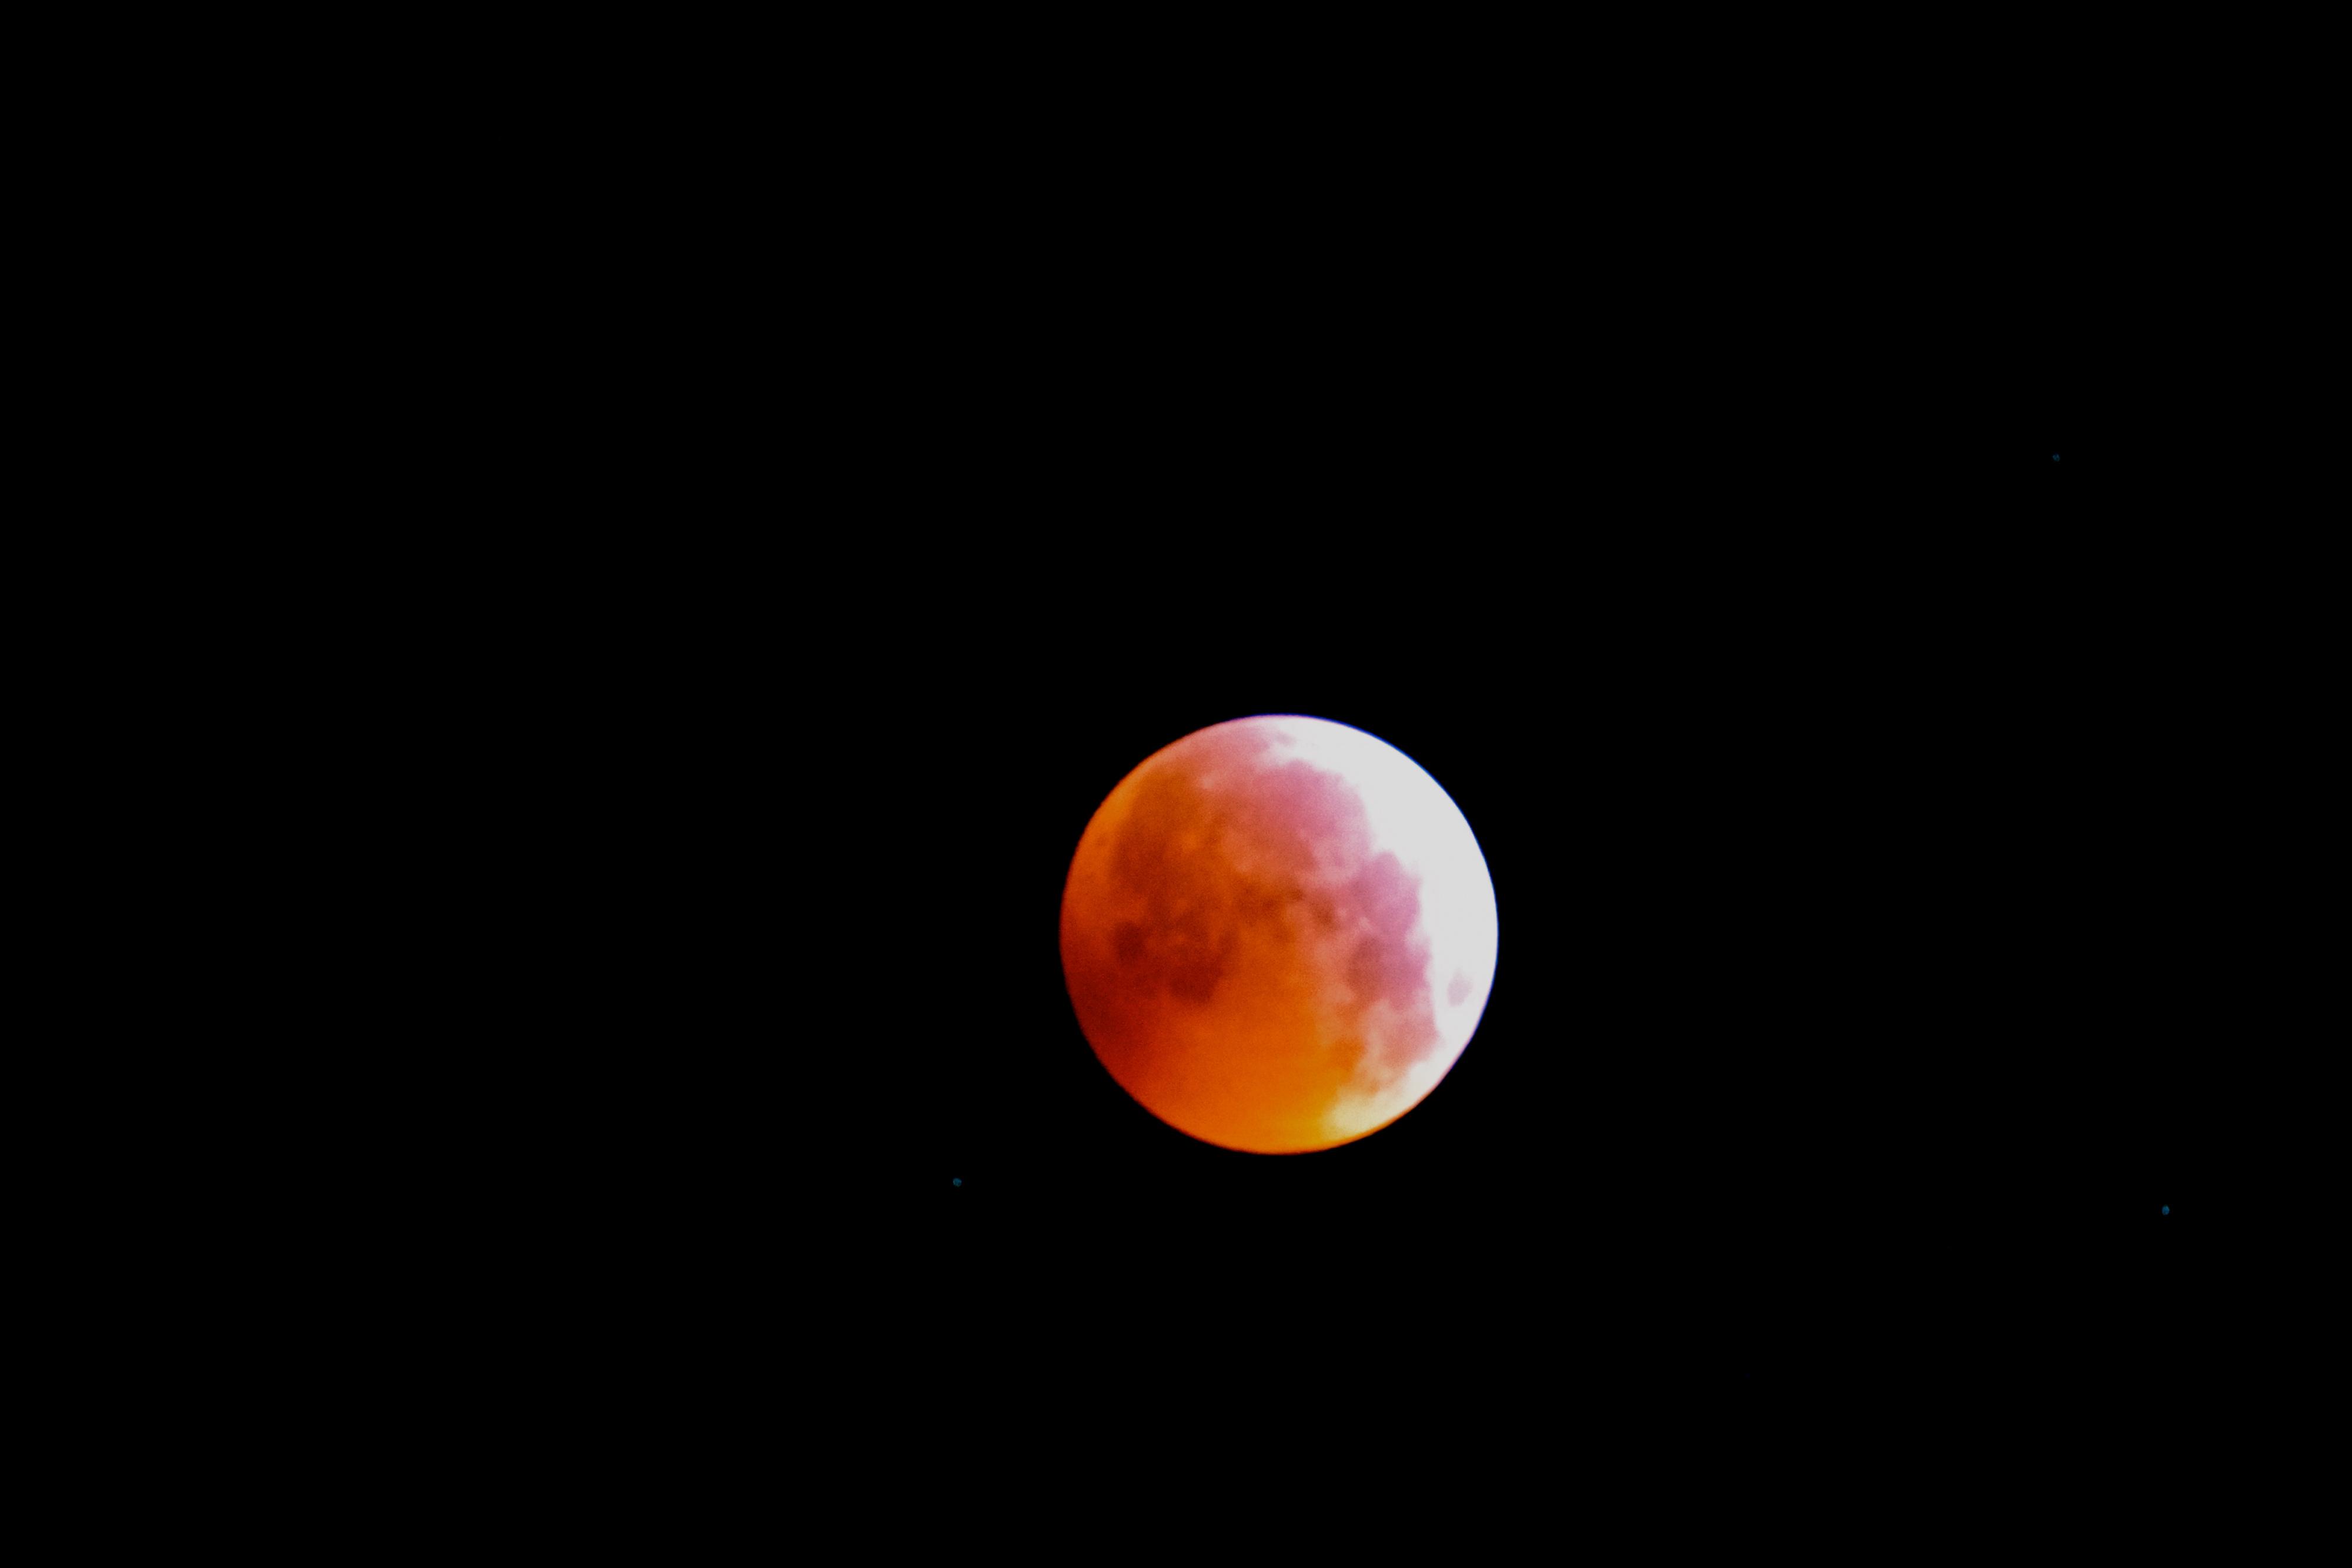 Eclipse de Lune  lundi 21 janvier 2019